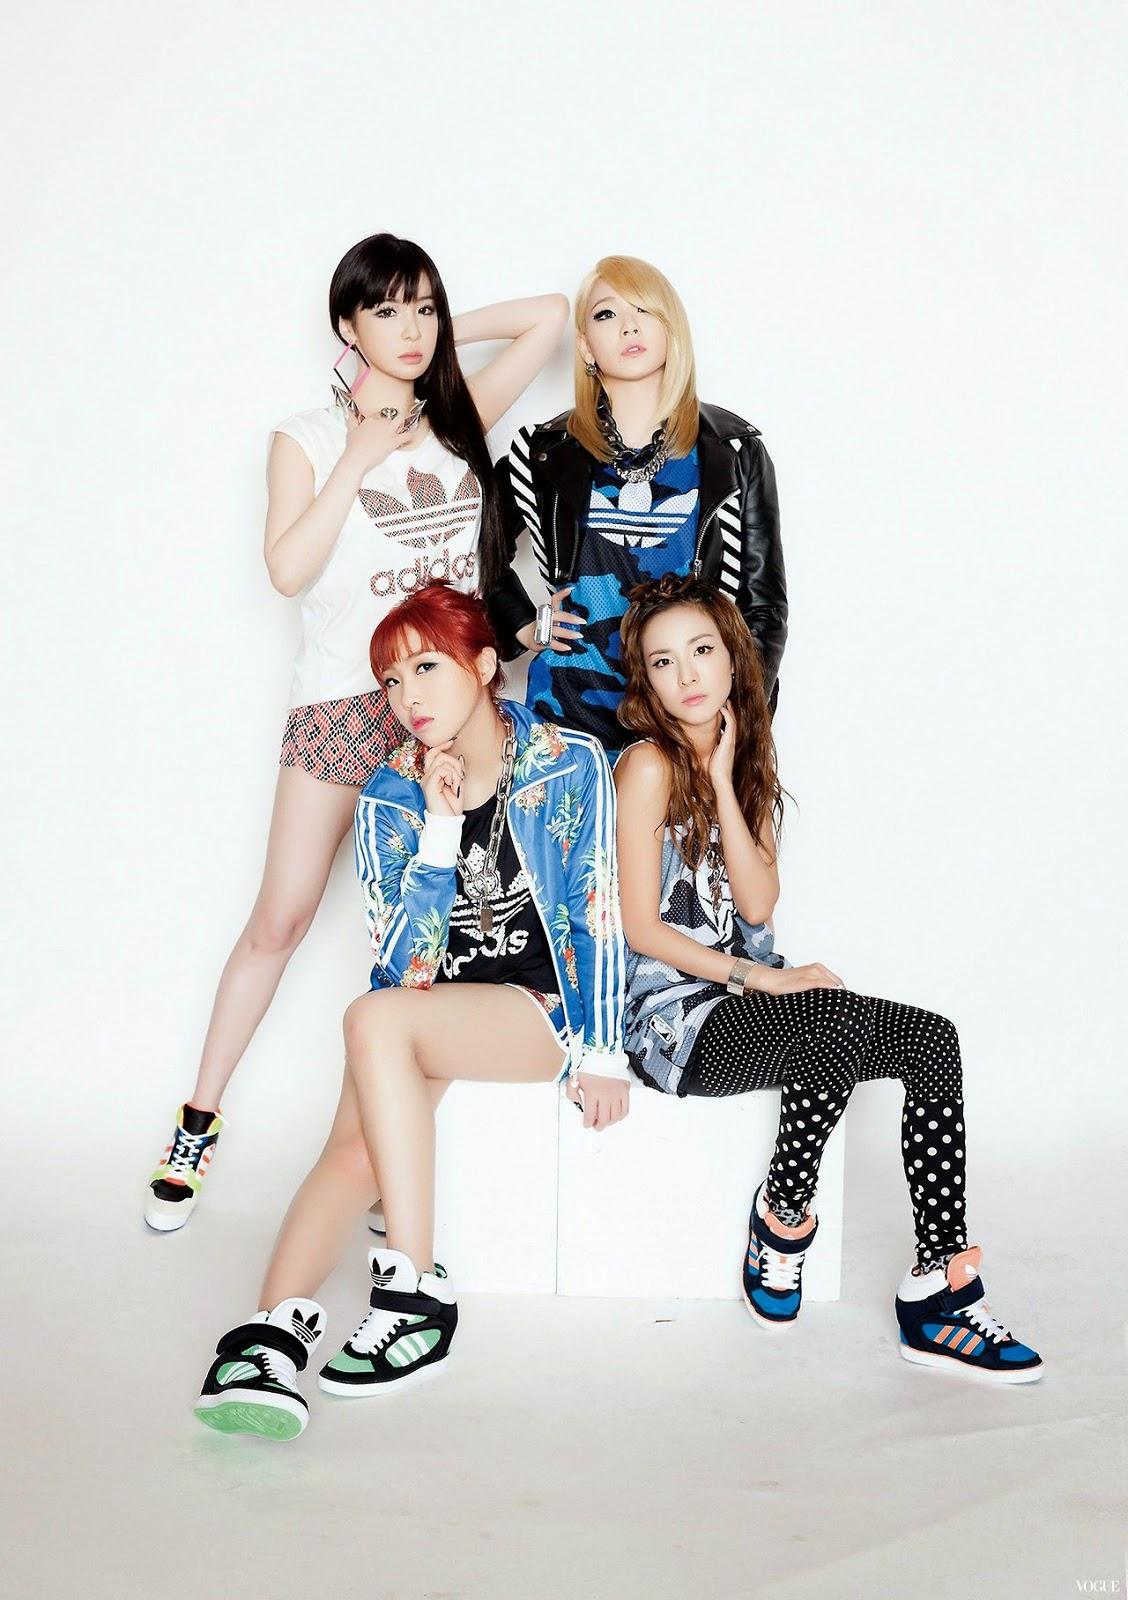 2NE1 - Adidas CF